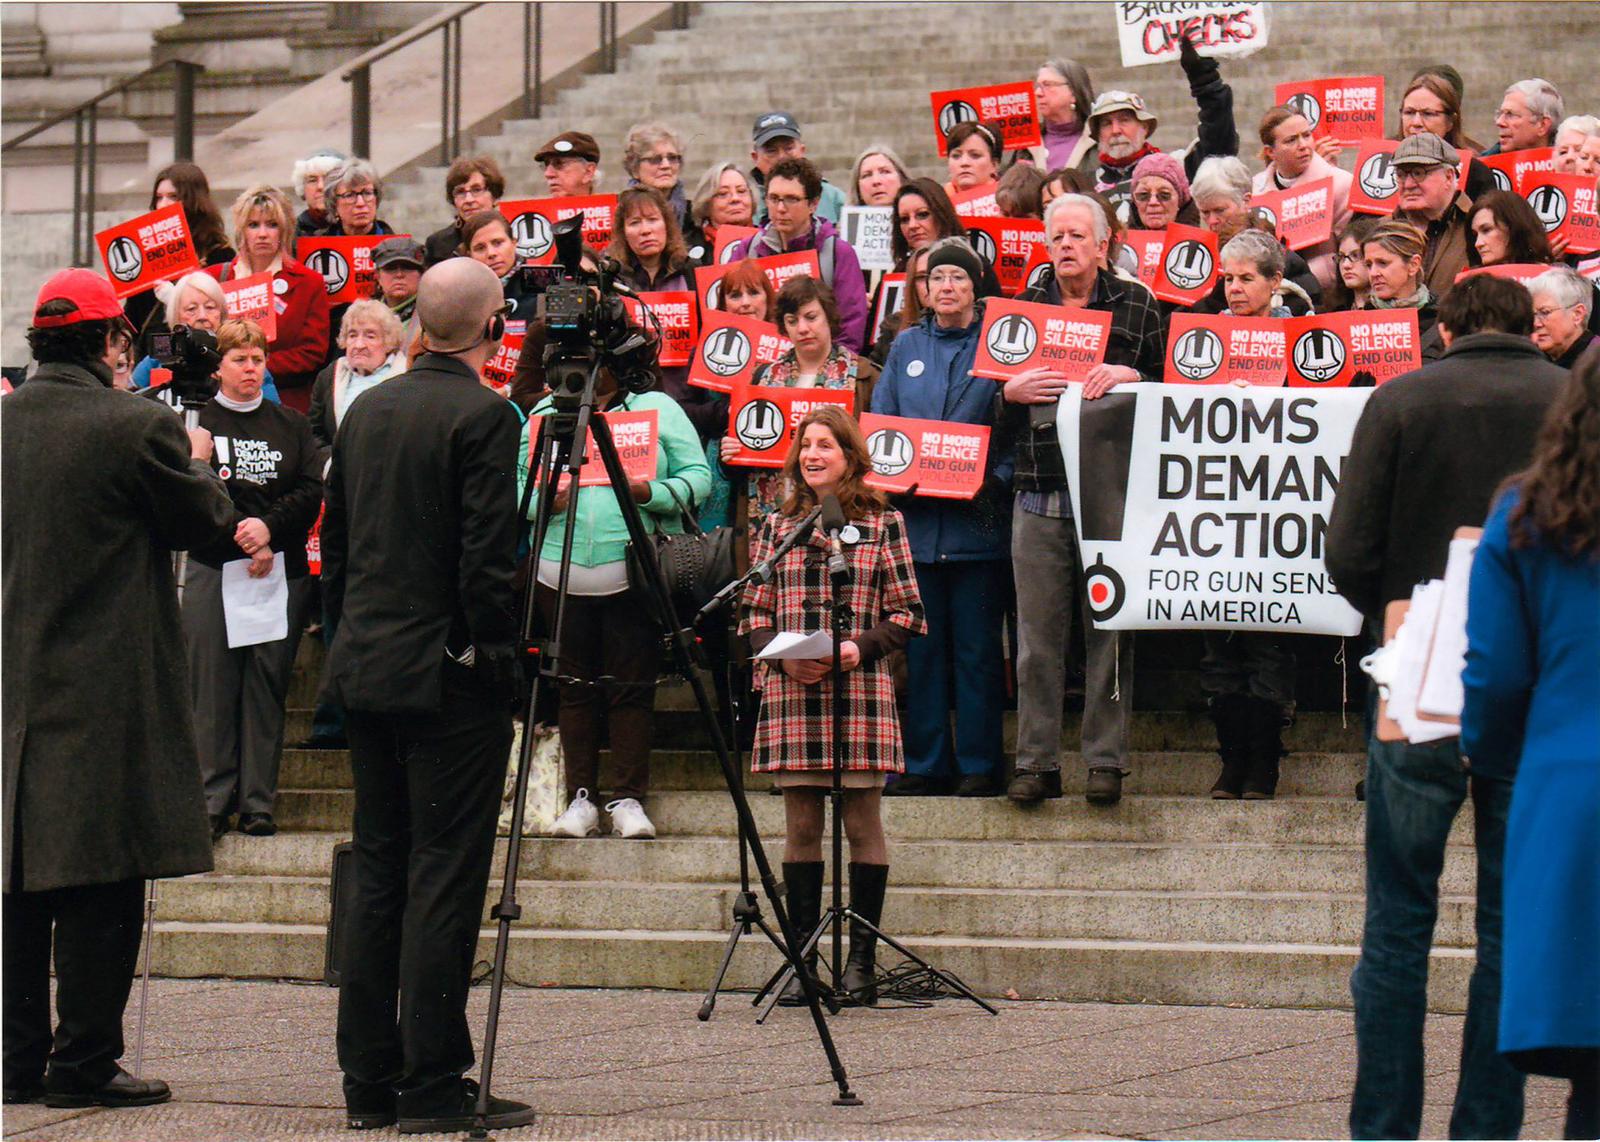 Tana speaking at a demonstration against gun violence.